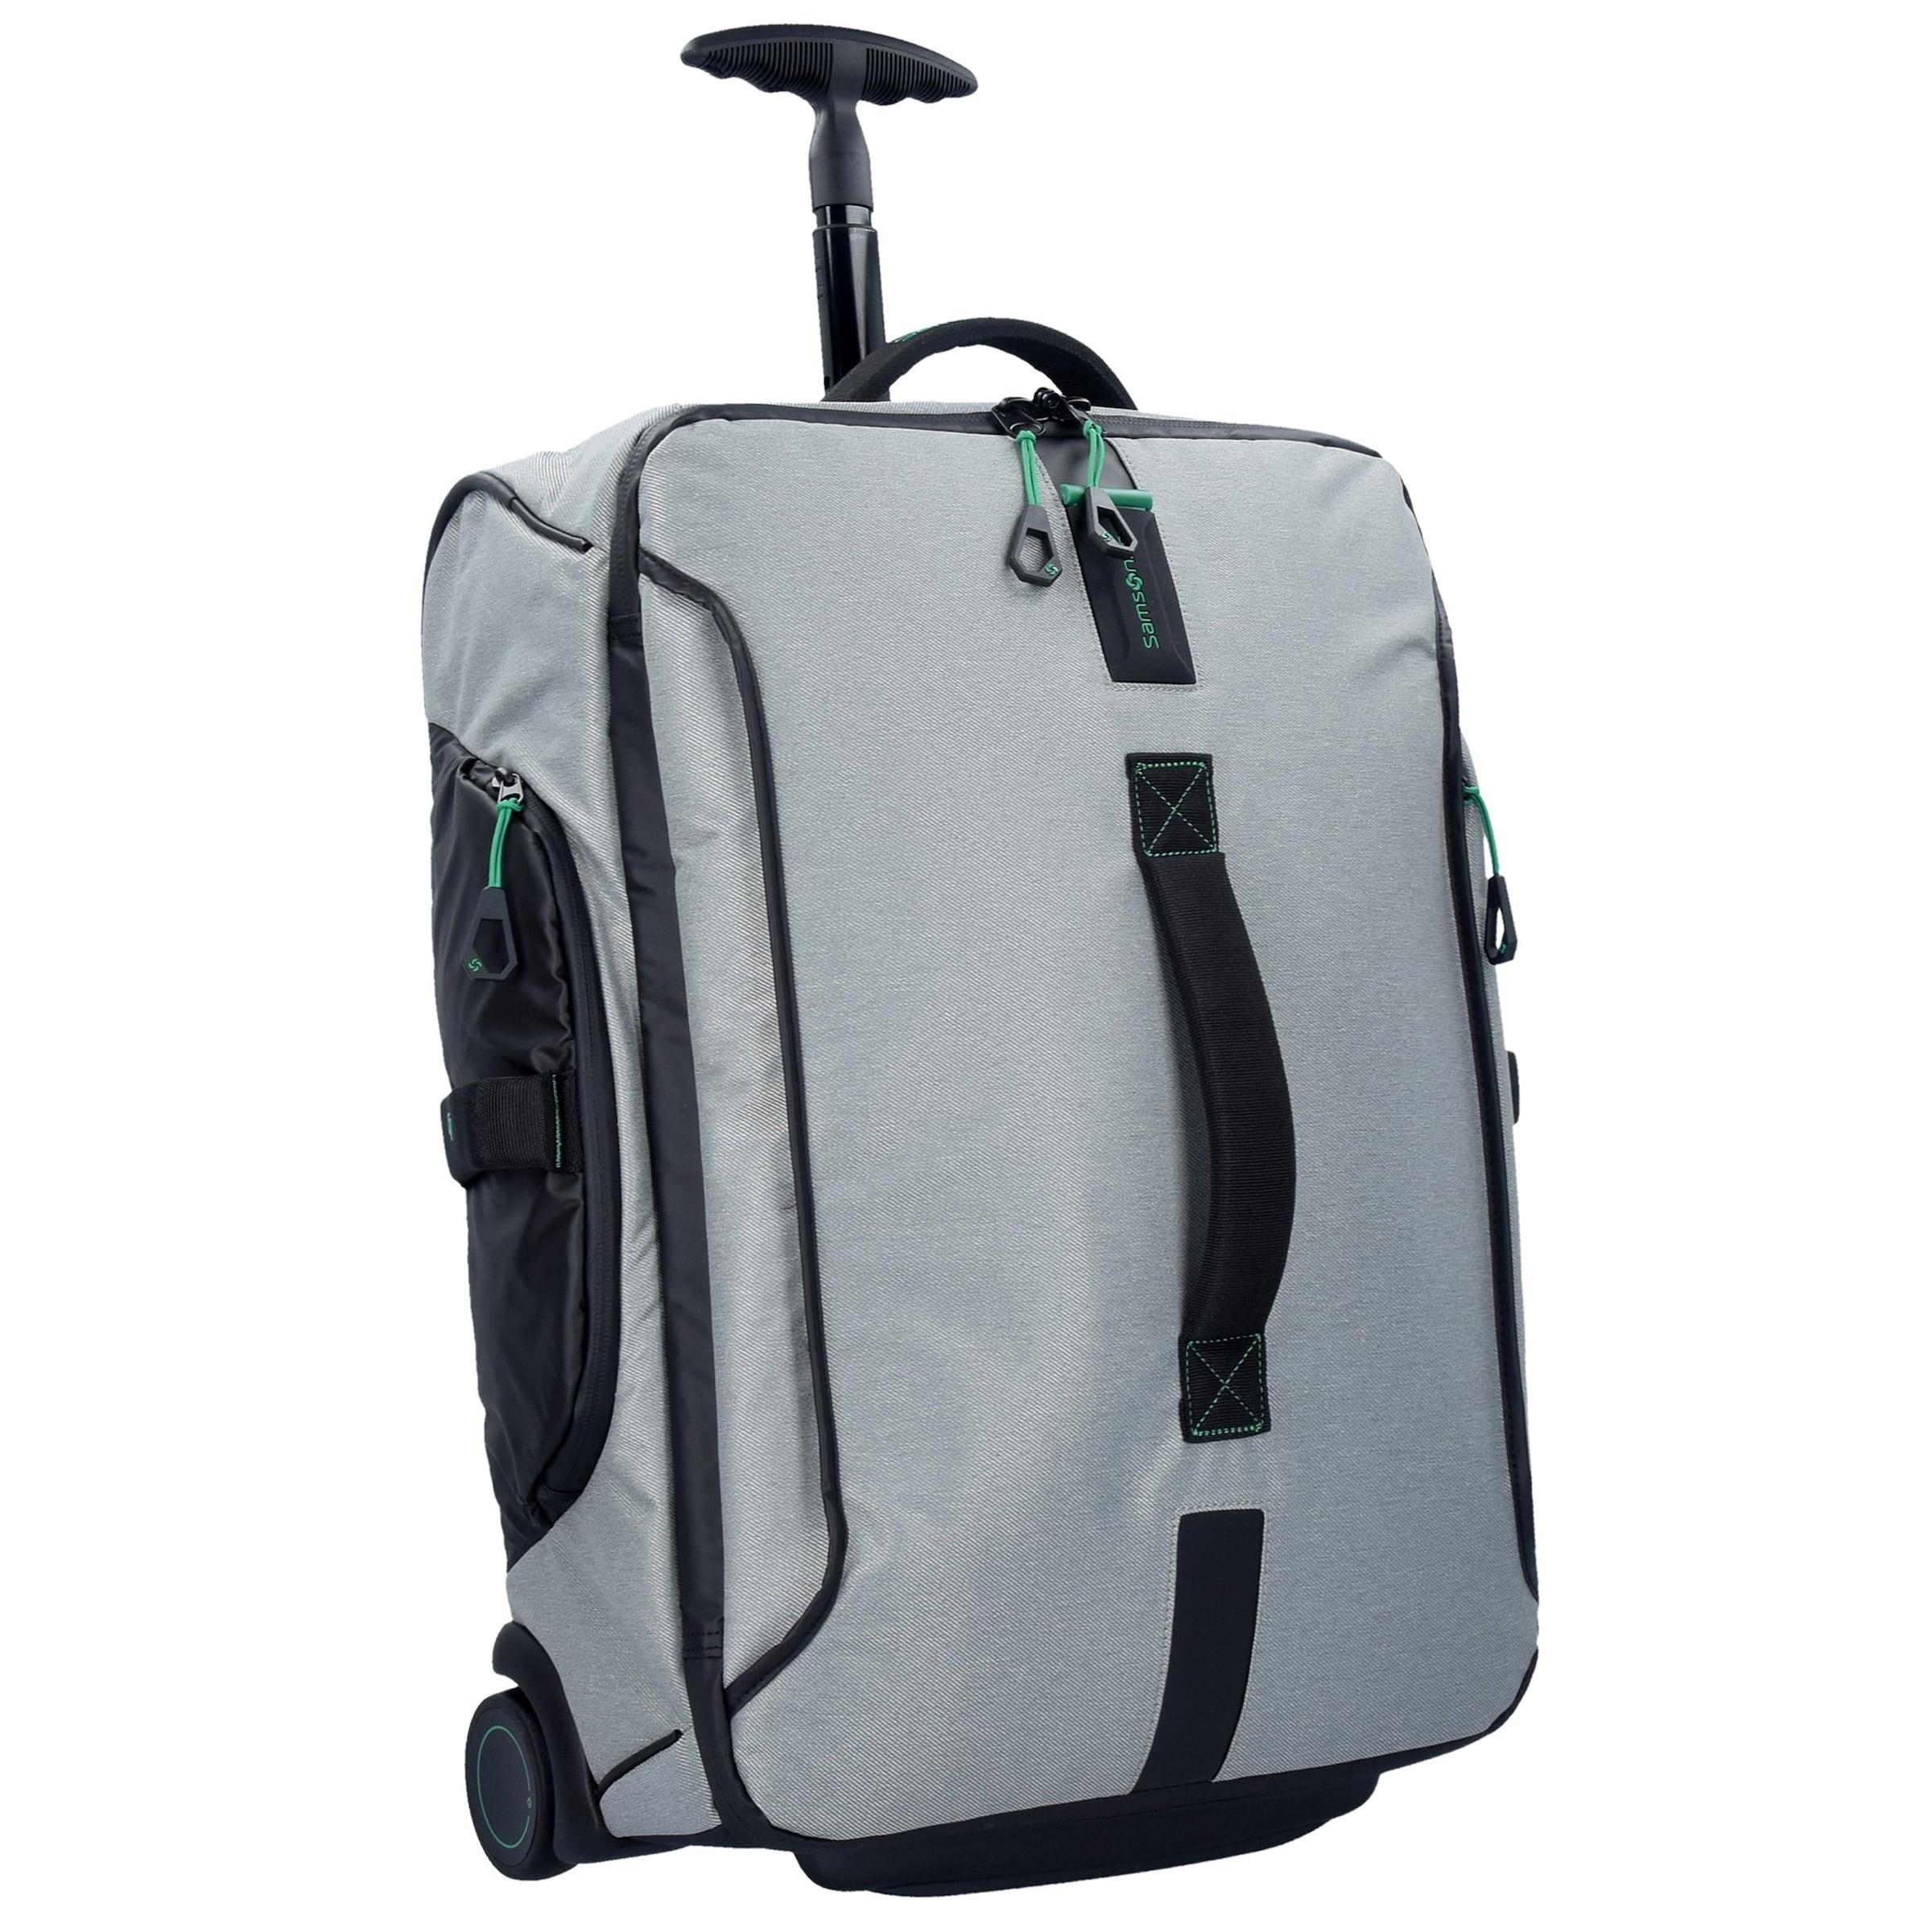 SAMSONITE Paradiver Light Rollen-Reisetasche I 55 cm Rabatt Günstigsten Preis x19LdwLzw